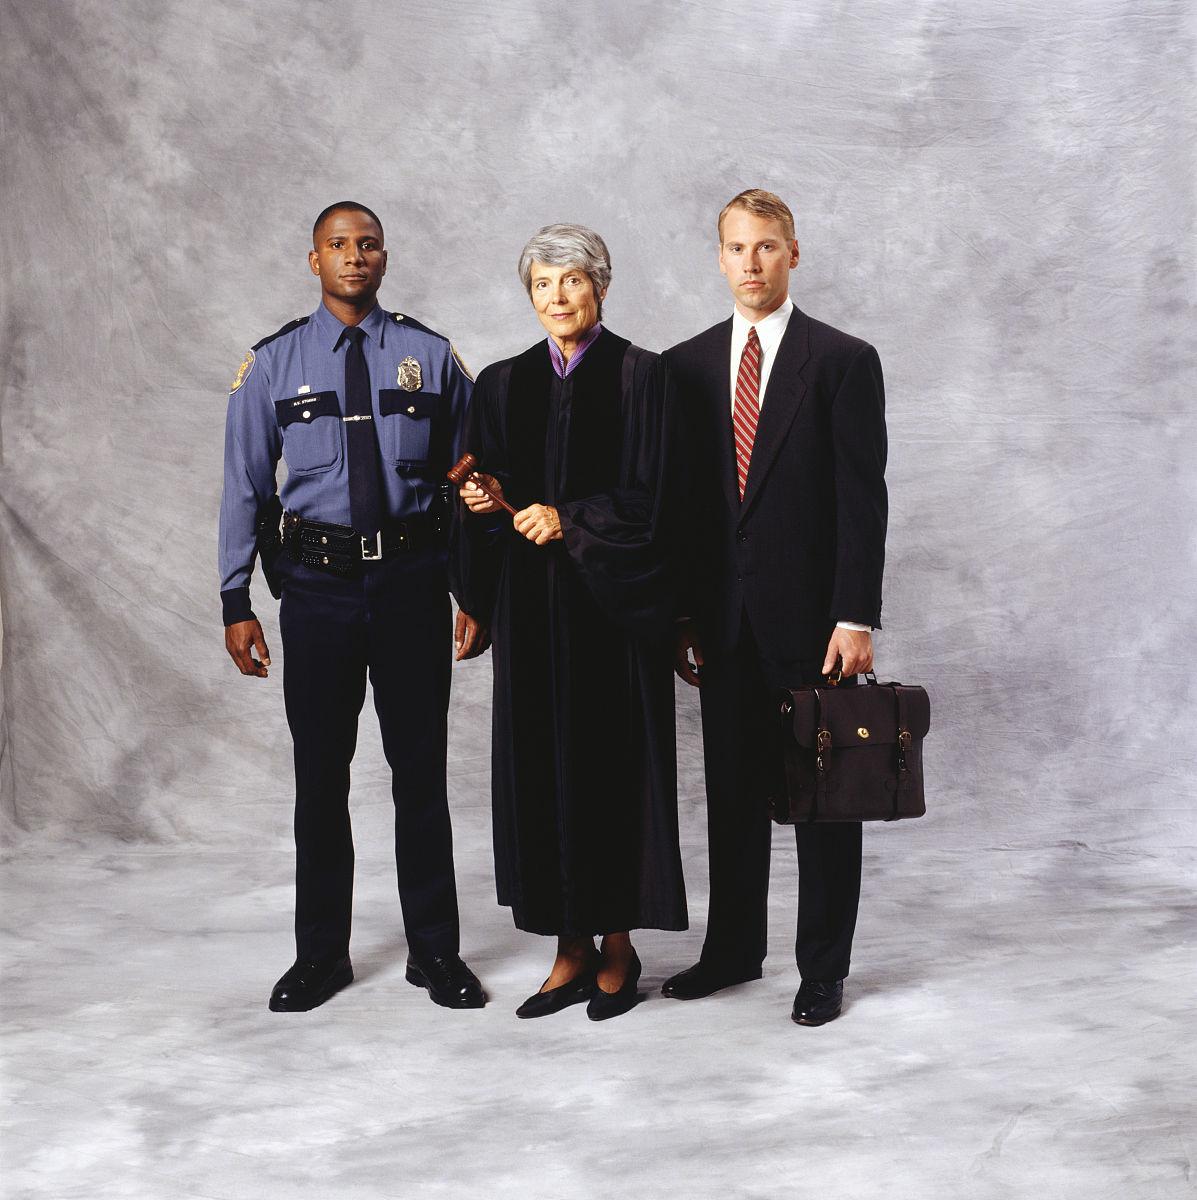 警官�y�-��+_警官,法官和律师(肖像)